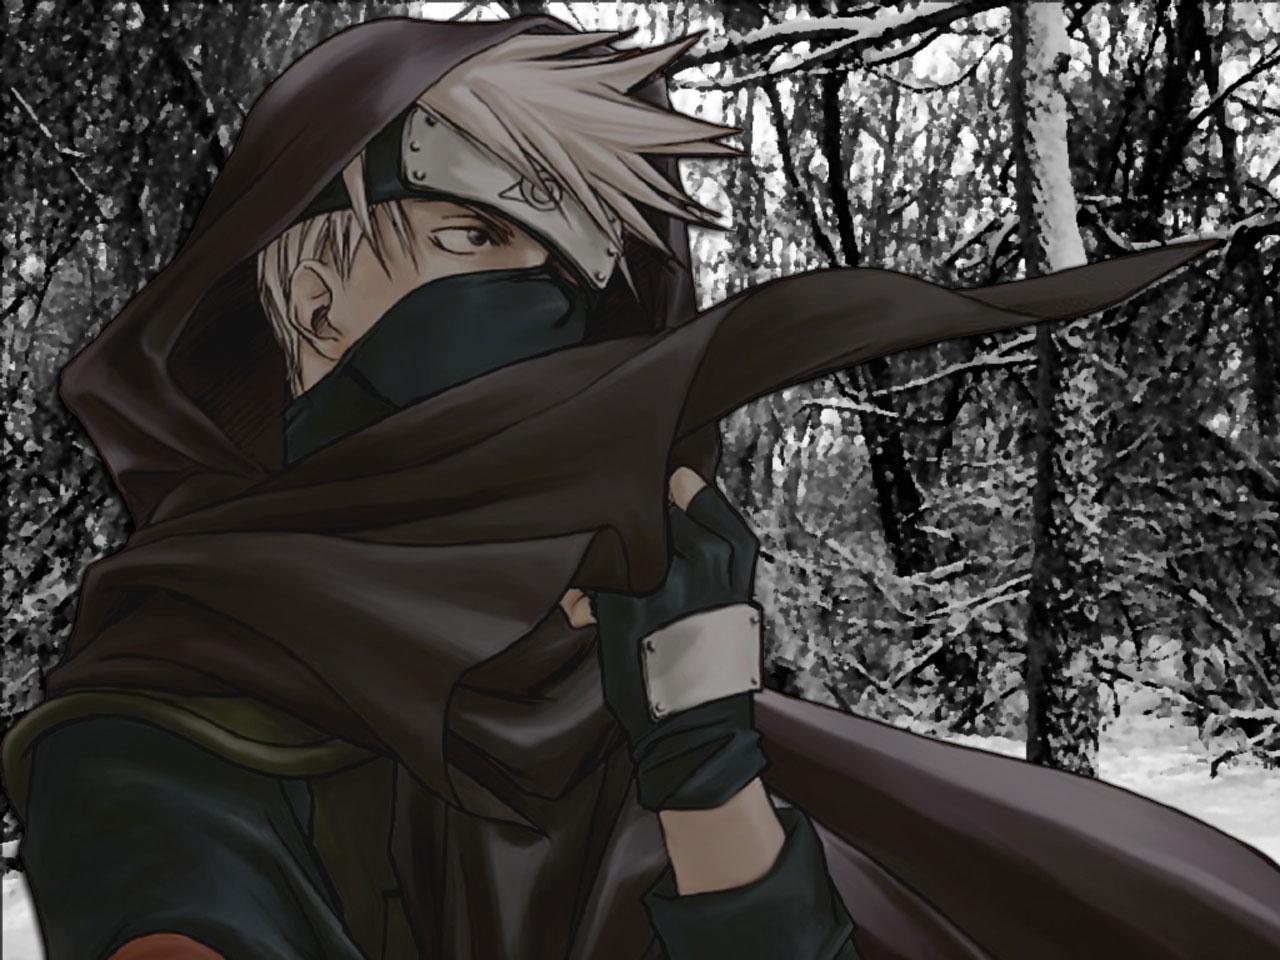 Download Anime Wallpaper Kakashi Naruto movie Anime 1280x960